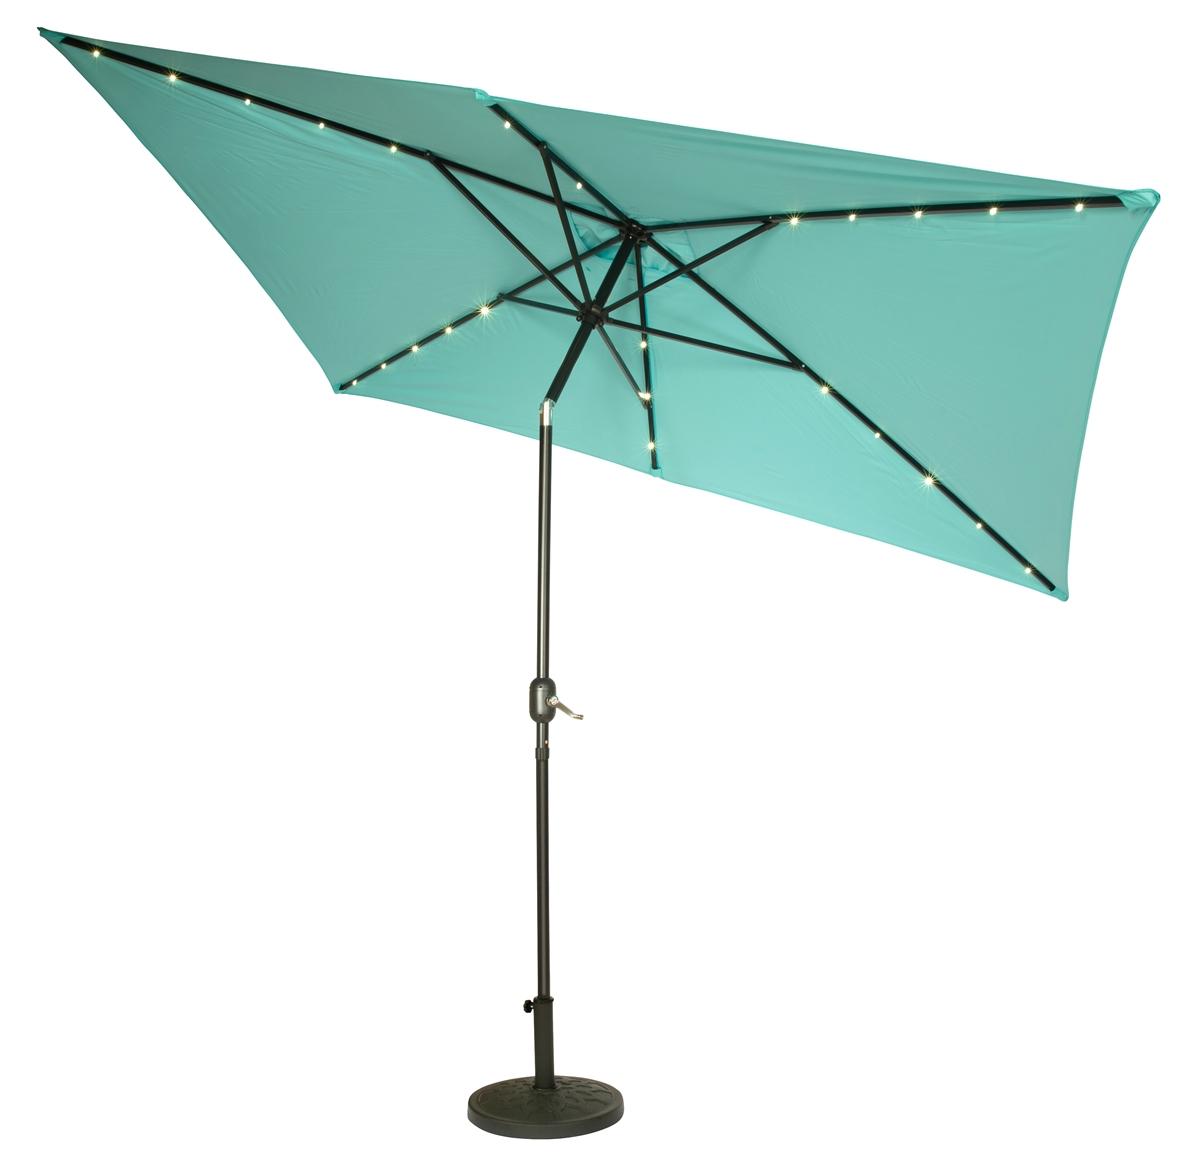 Best And Newest Wiechmann Market Sunbrella Umbrellas With Pretty Rectangle Umbrella Akzprt Akz Plus Cantilever Lowe's Patio (Gallery 19 of 20)